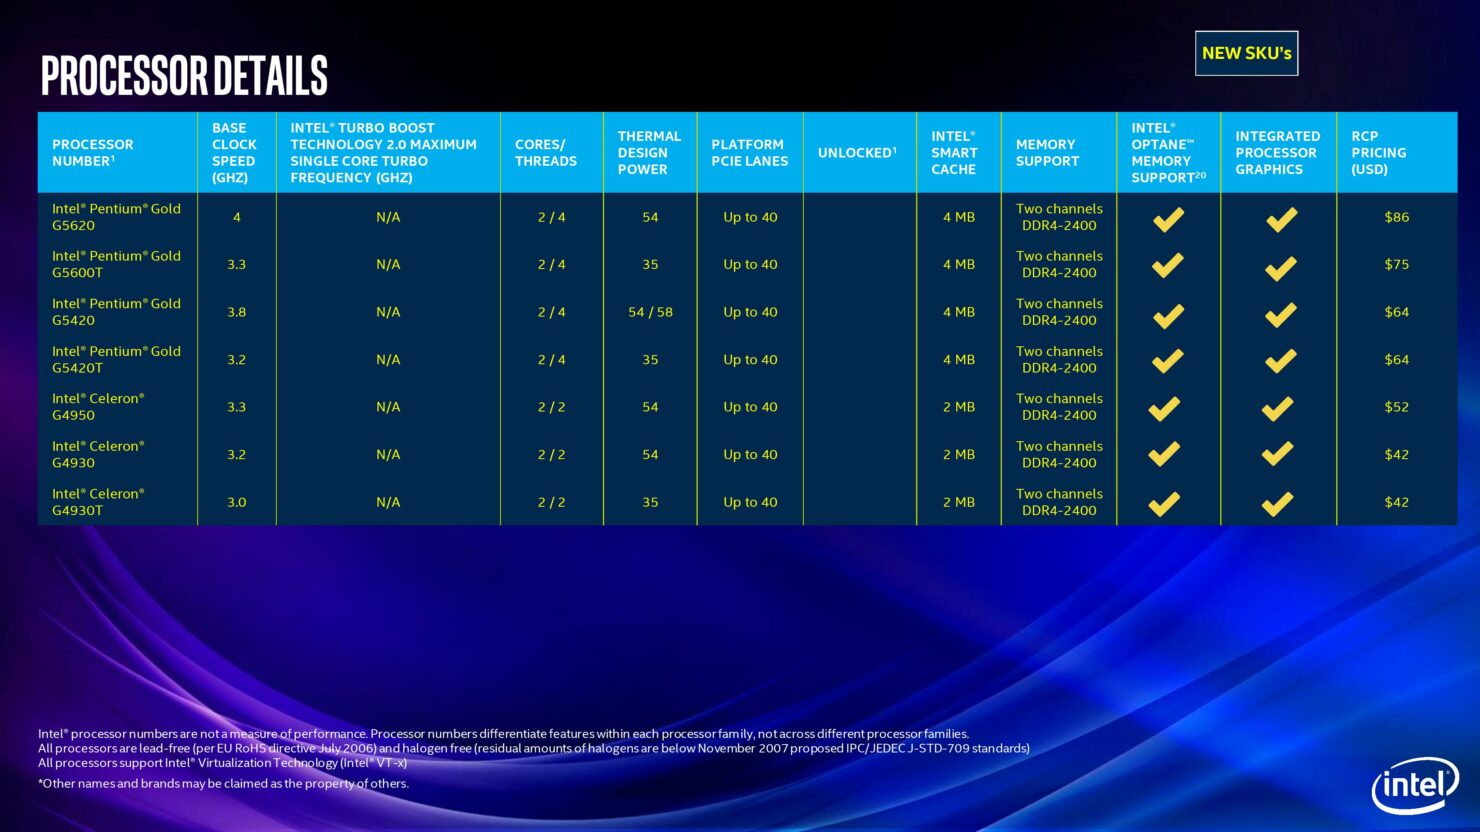 9th-gen-intel-core-mobile-launch-presentation-under-nda-until-april-23-page-025